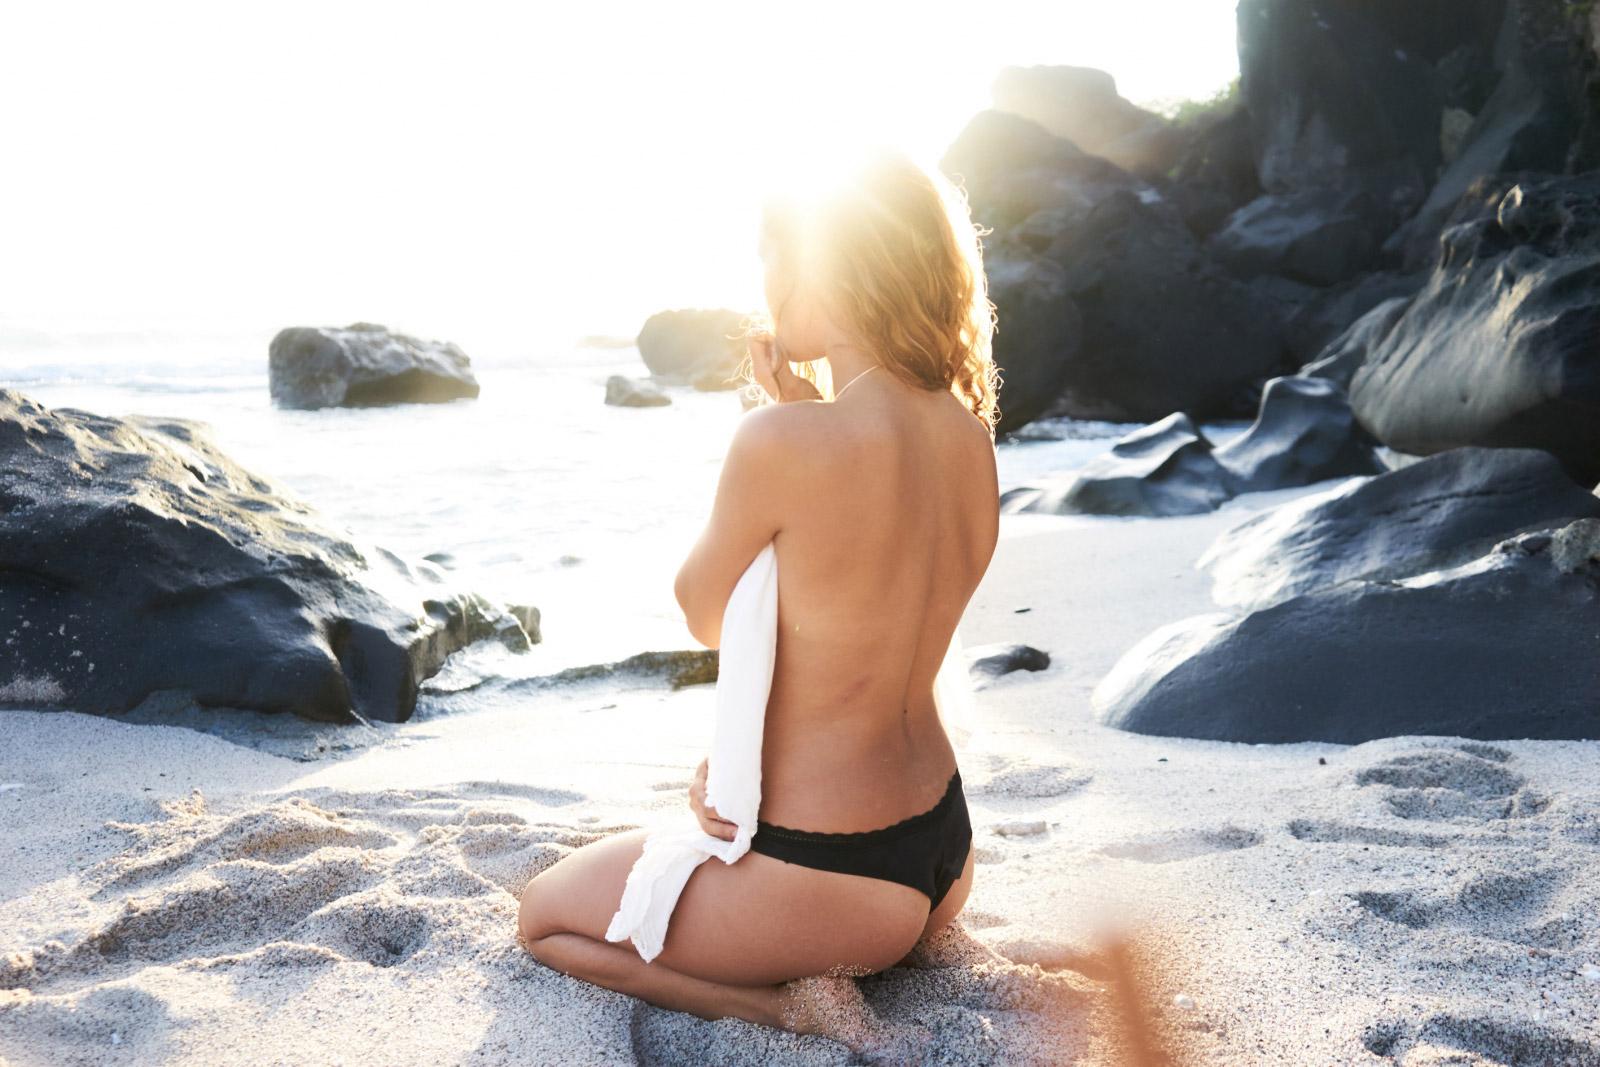 Thalgo-Bronzing-Activator-Lotion-Lait-Activateur-de-Bronzage-abloomnova.net_-1600x1067 Why do we love to tan?